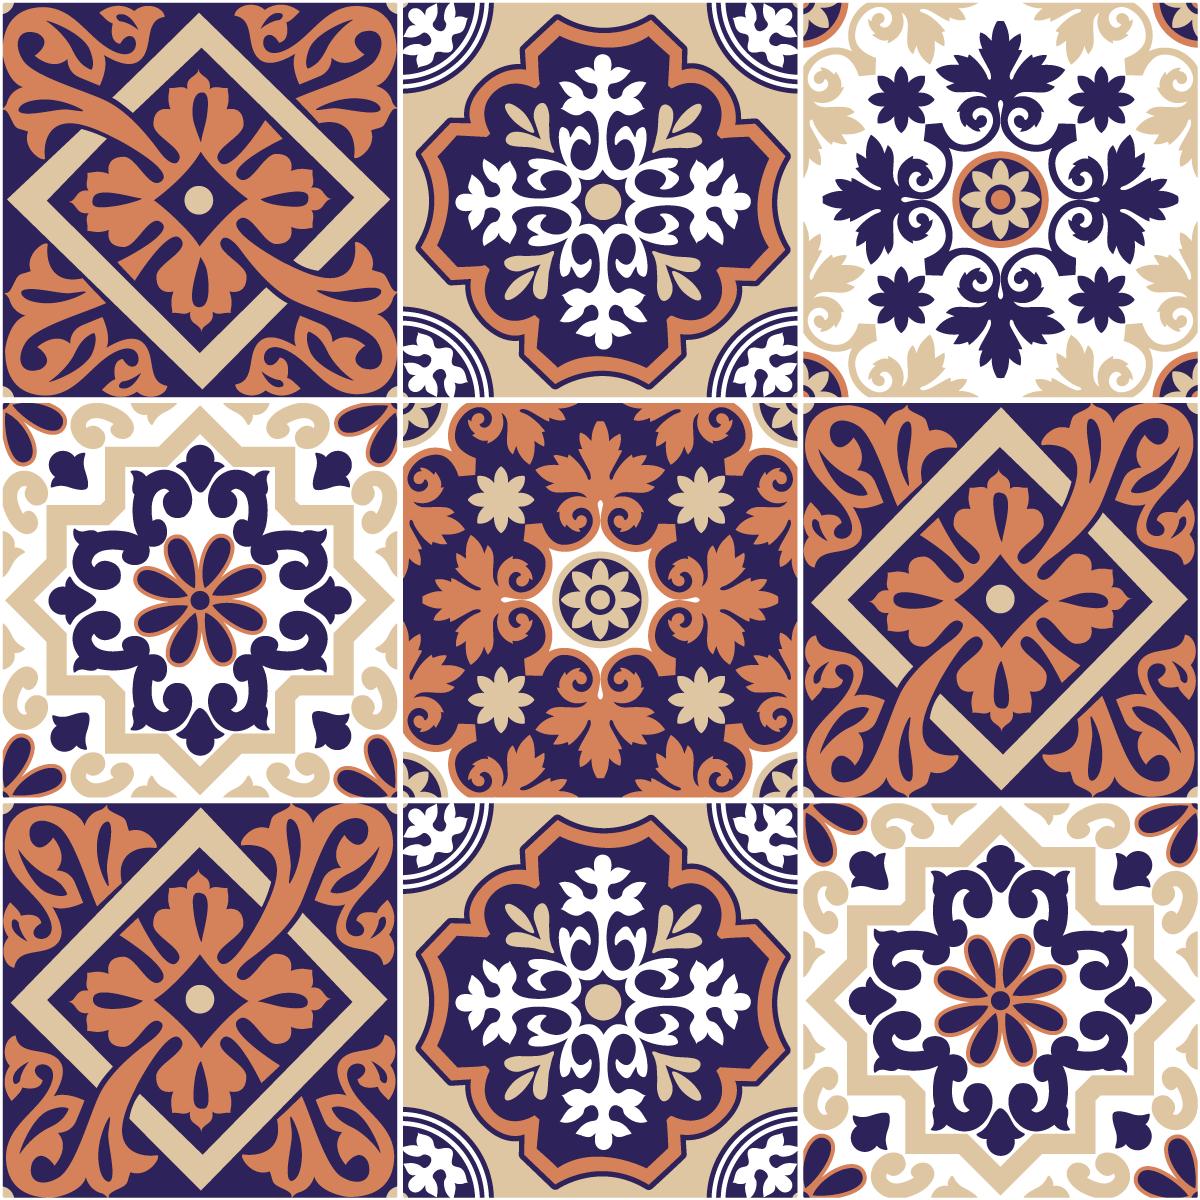 9 stickers carrelages azulejos ornement arabesque art et design artistiques ambiance sticker. Black Bedroom Furniture Sets. Home Design Ideas